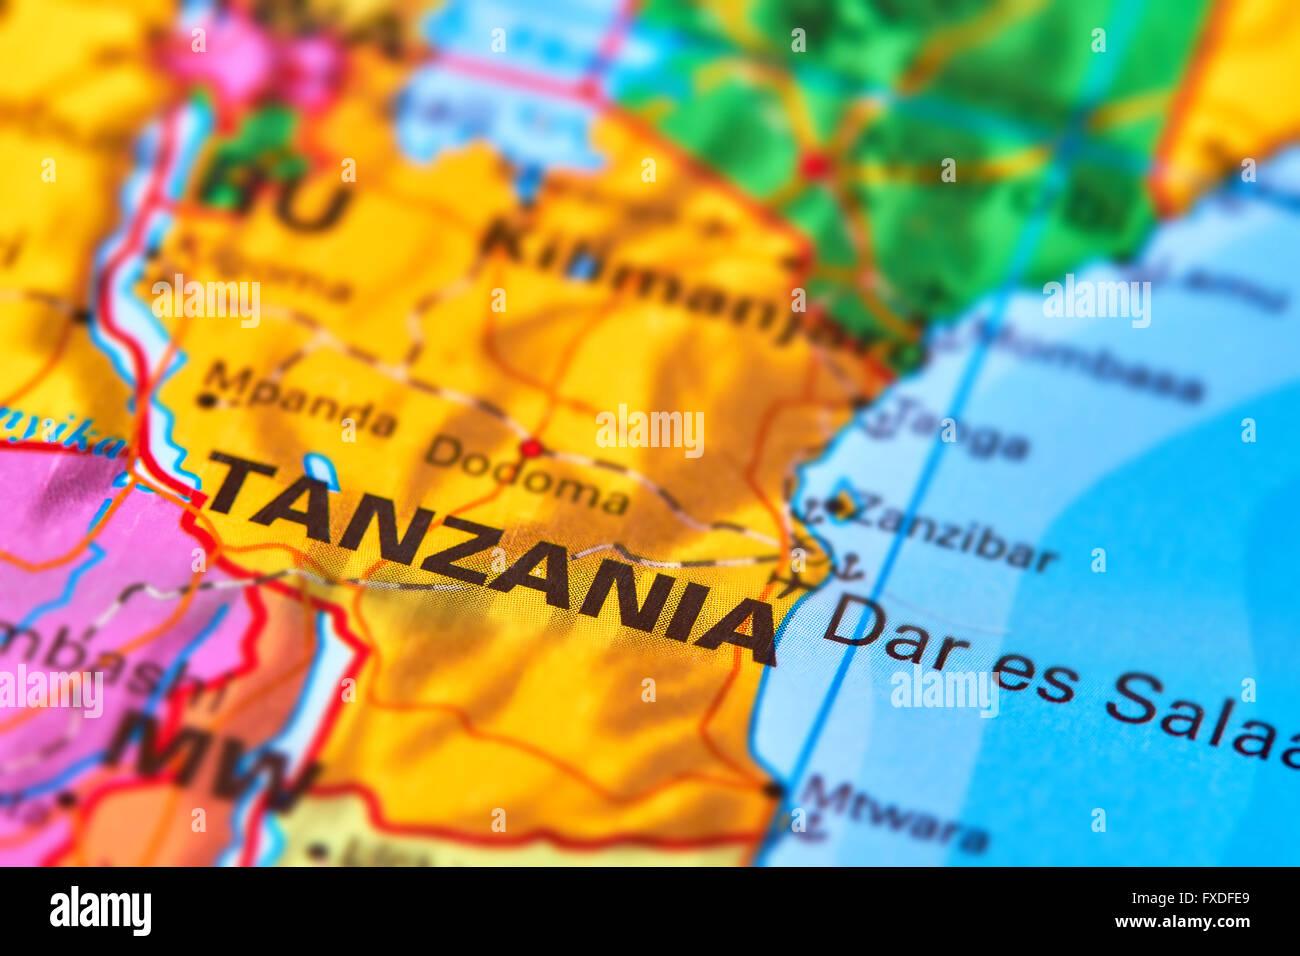 Africa tanzania map stock photos africa tanzania map stock images tanzania country in africa on the world map stock image gumiabroncs Choice Image